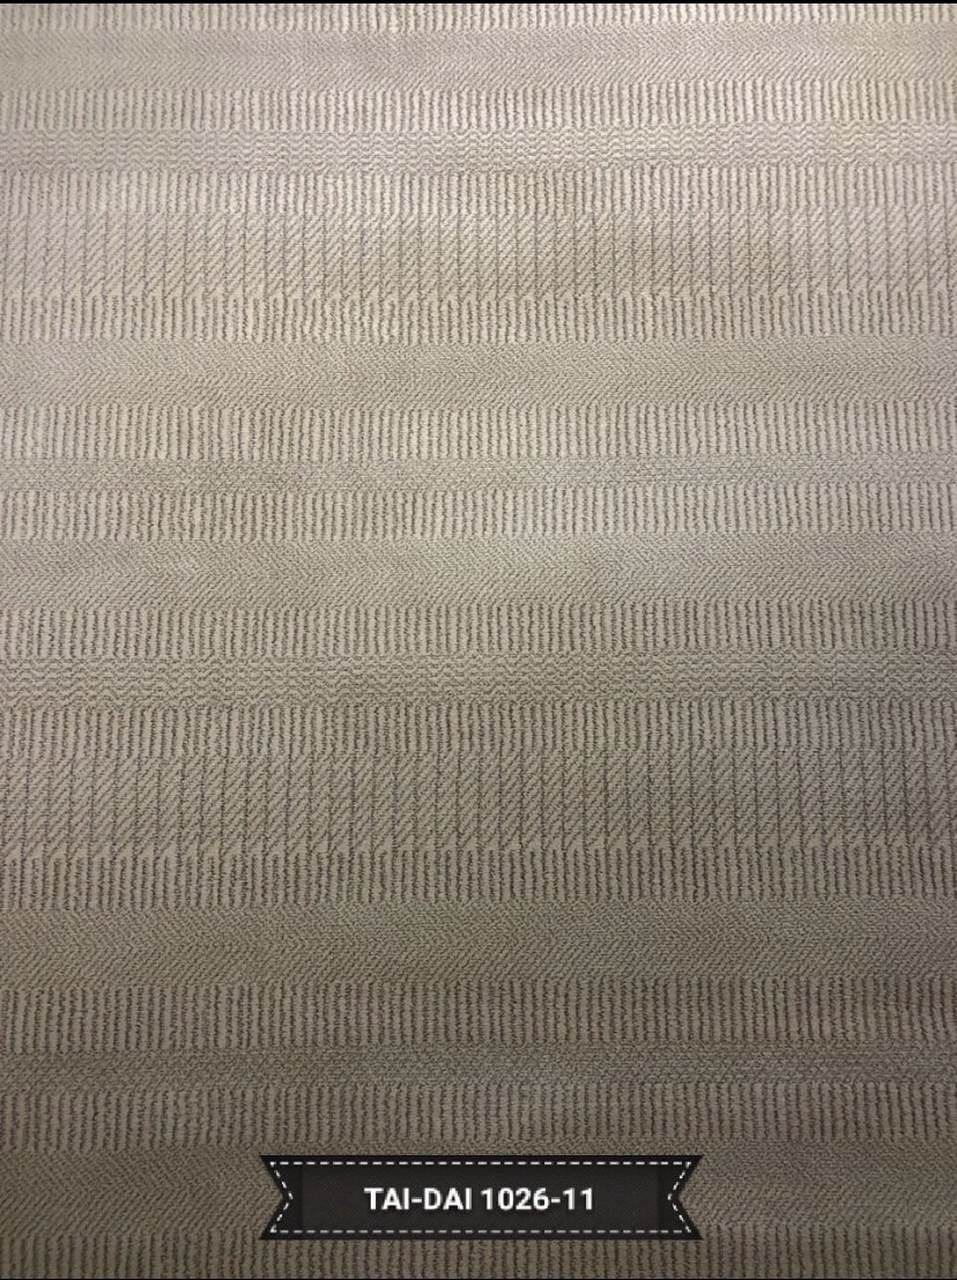 Tapete Tai Dai ref. 1026-11 - 200 x 250 cm